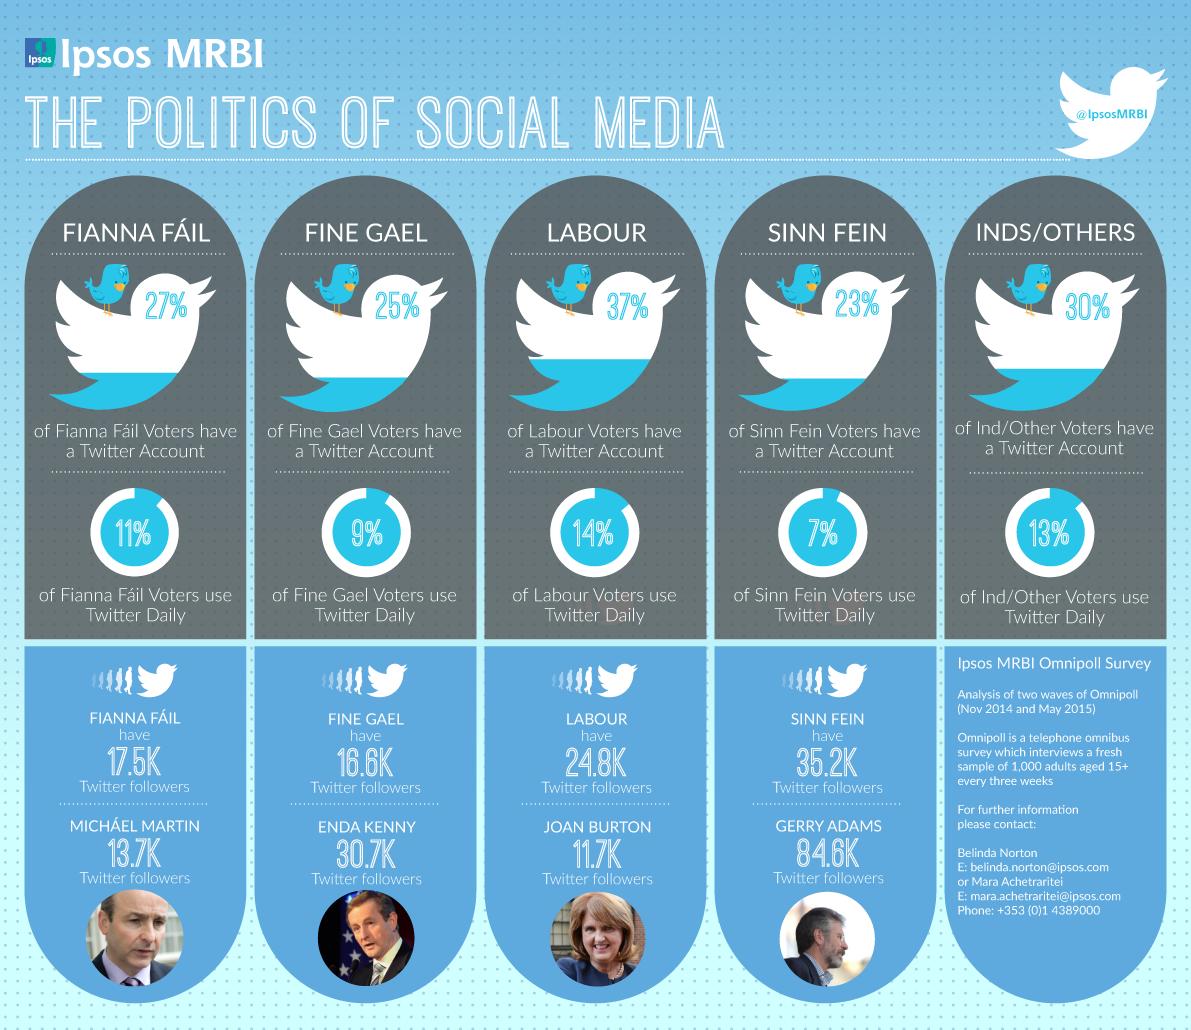 Ipsos MRBI The Politics of Social Media